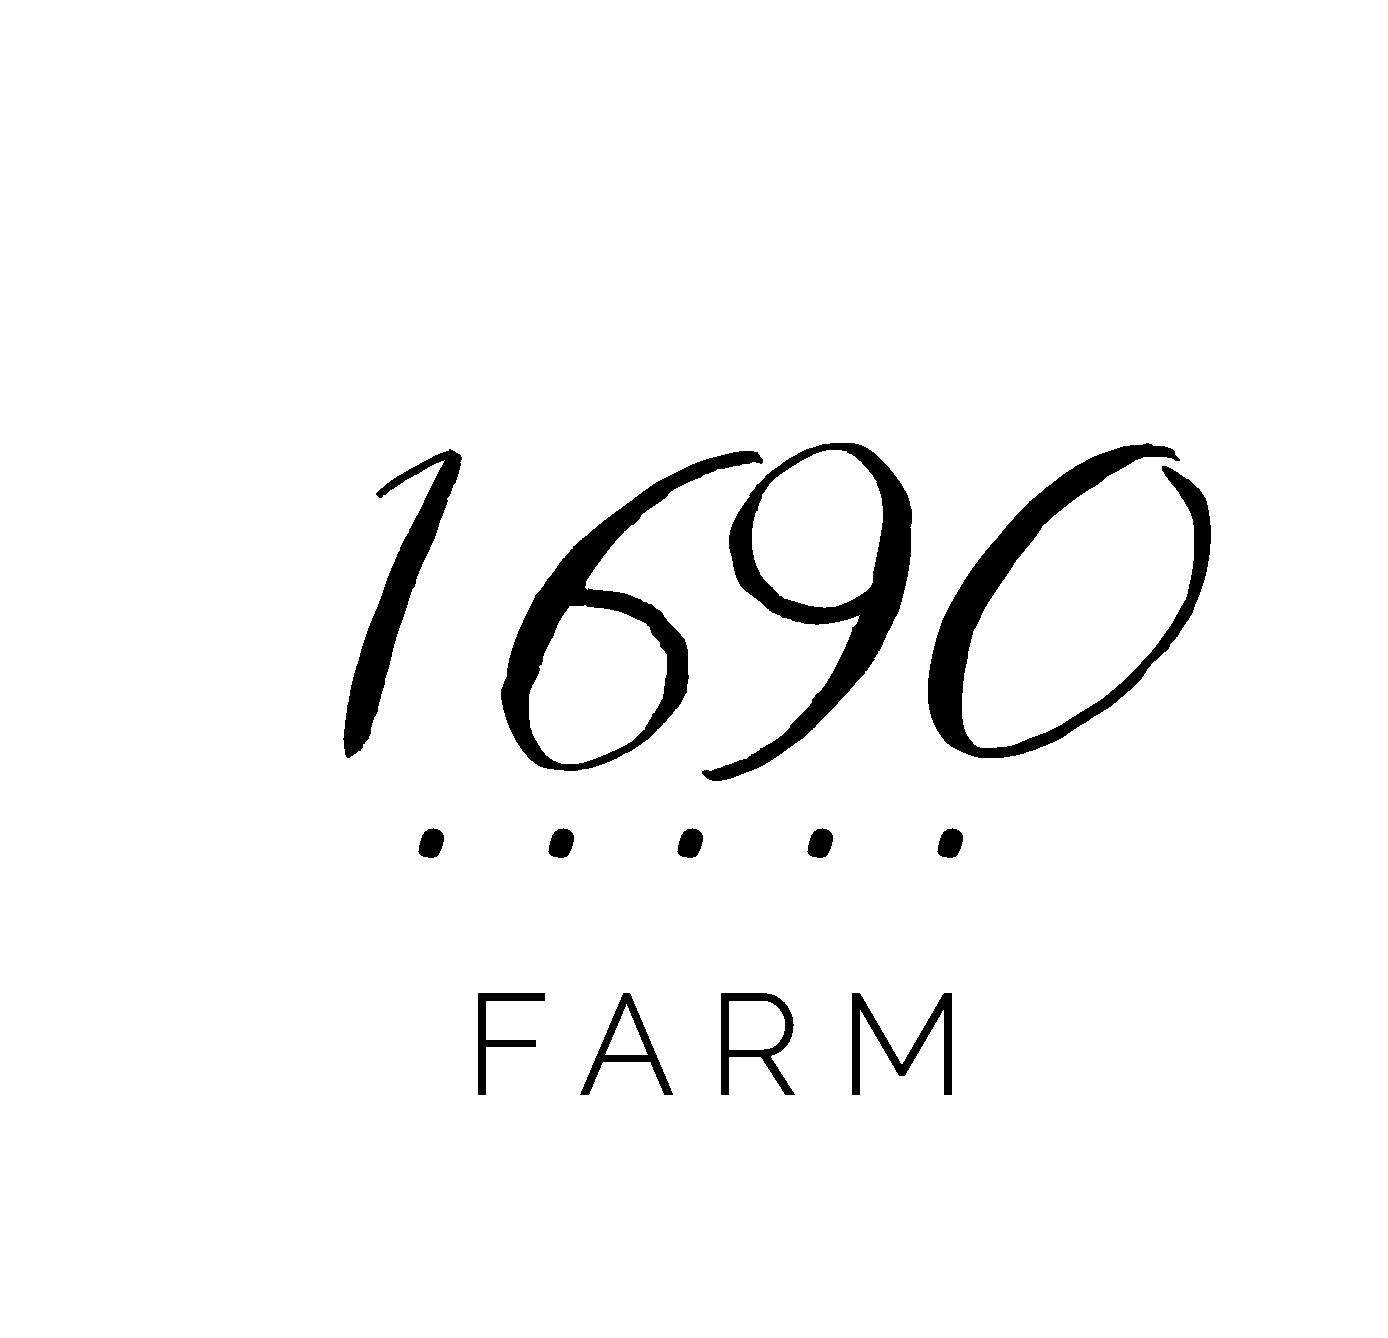 1690 Farm Logo